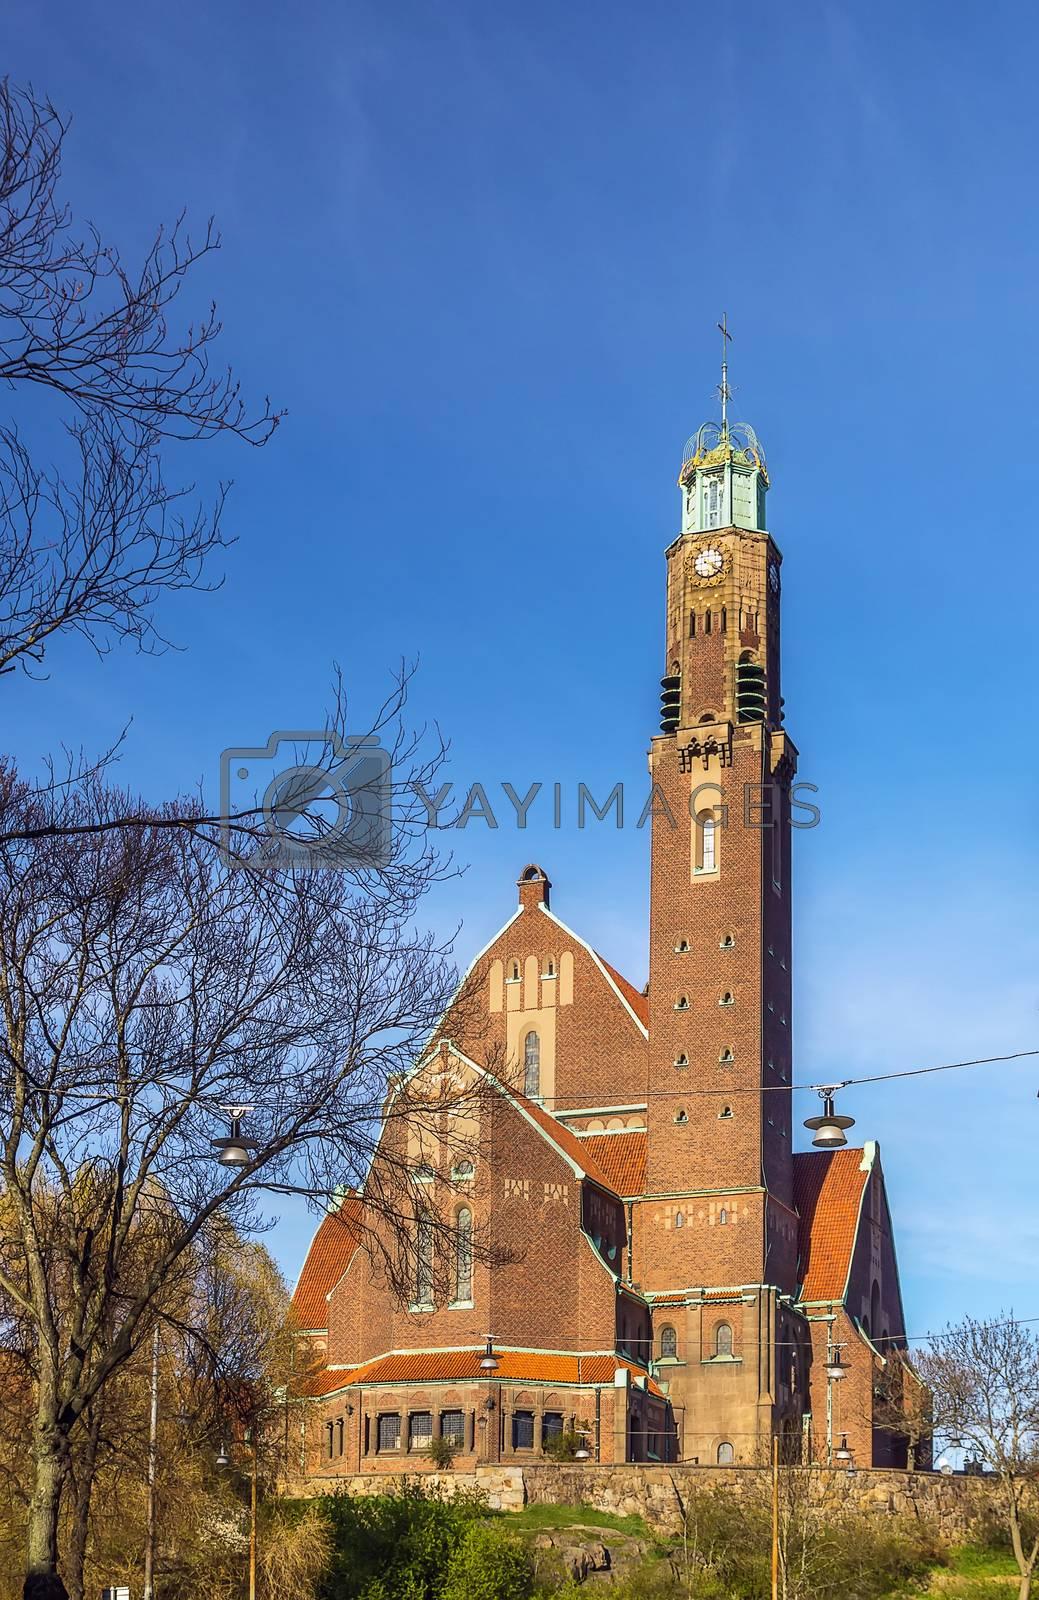 Engelbrekts church, Stockholm by borisb17